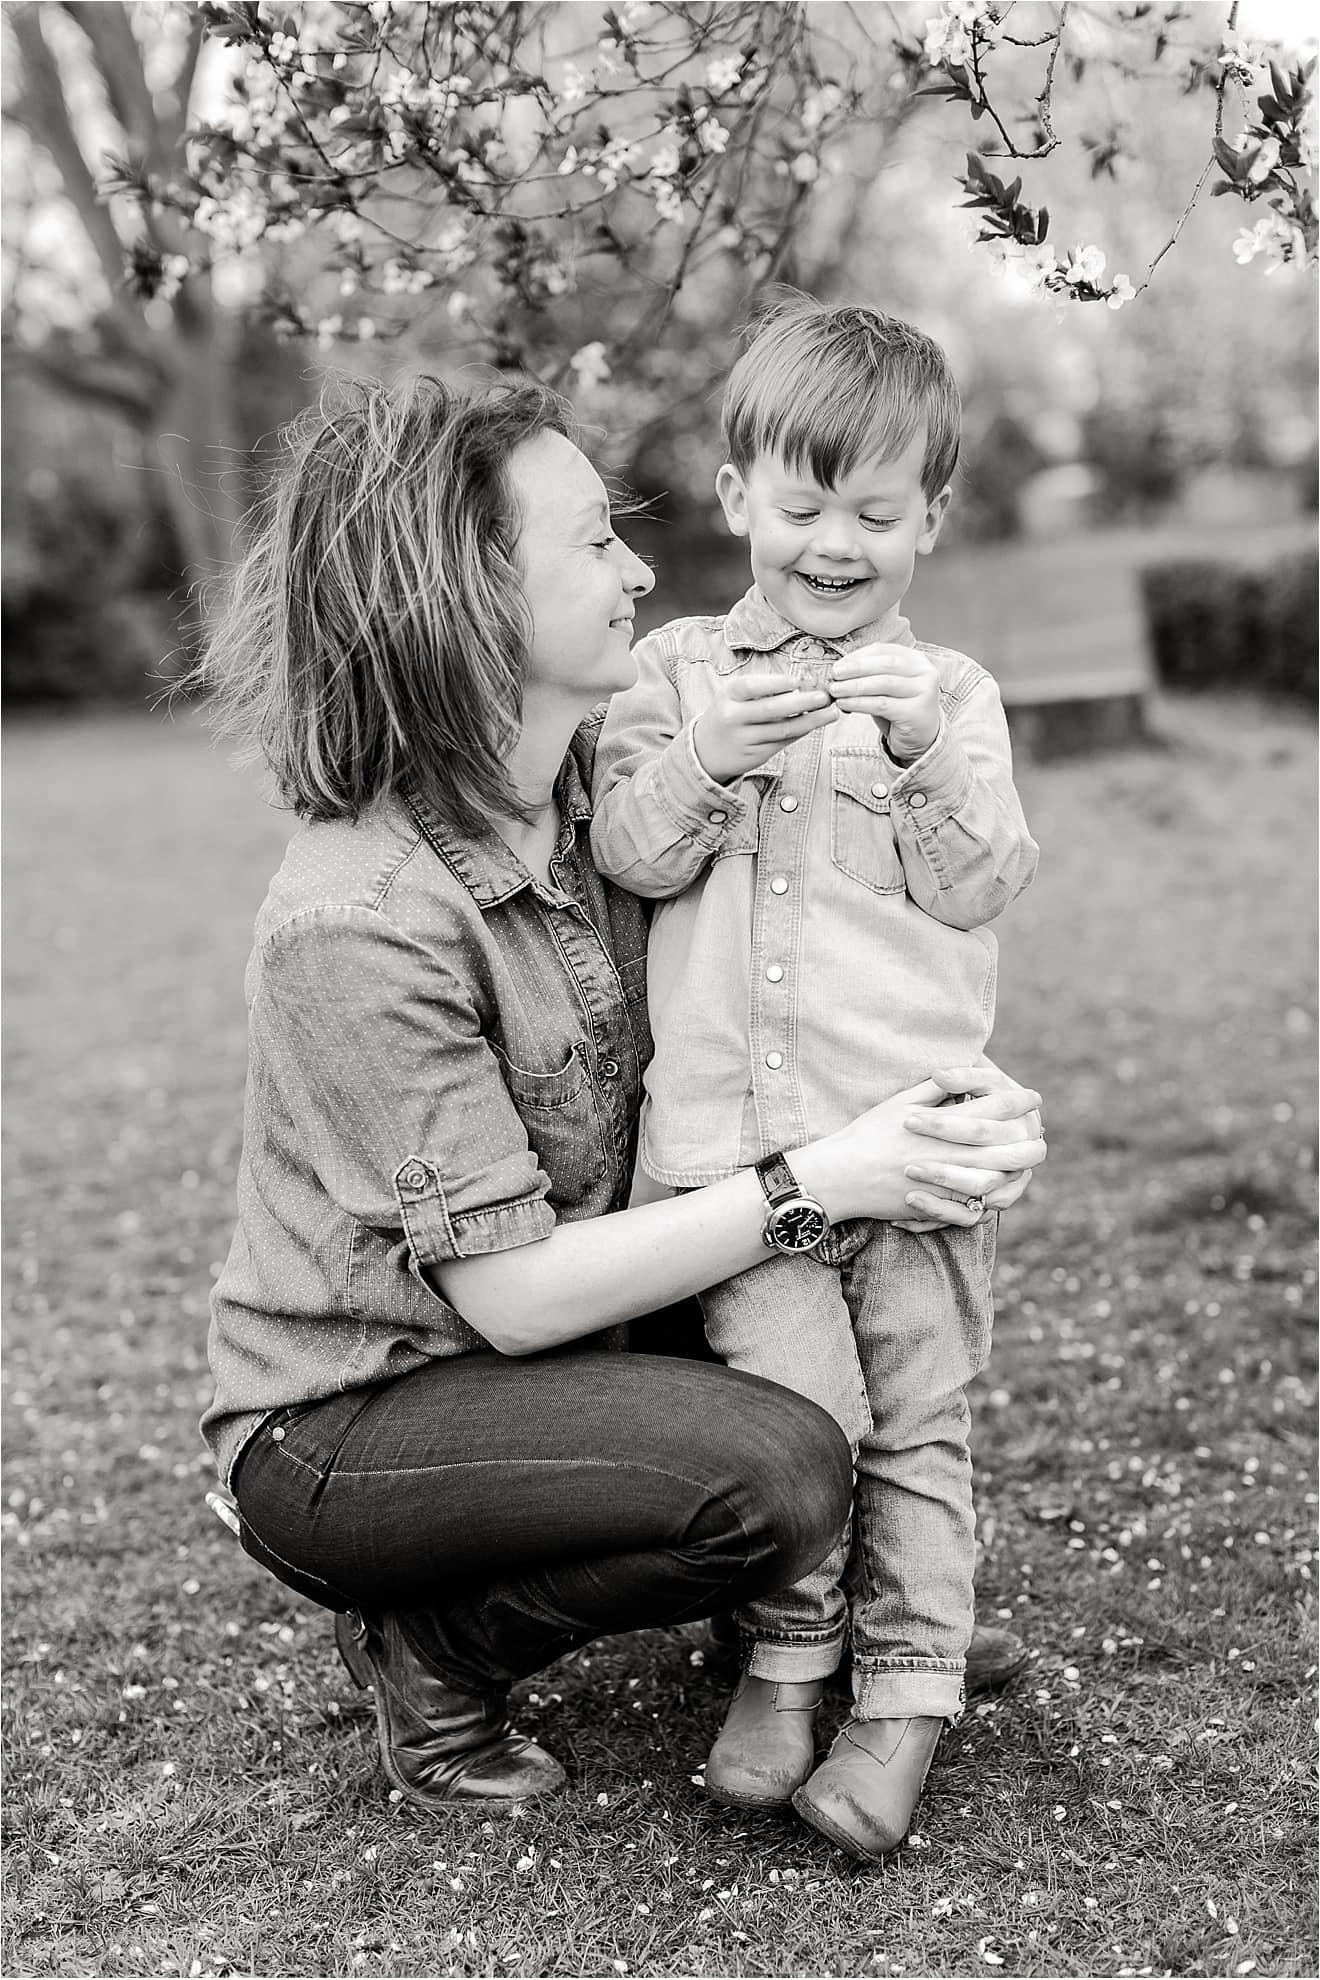 family-photography-spring-weybridge-eddie-judd-photography_0023